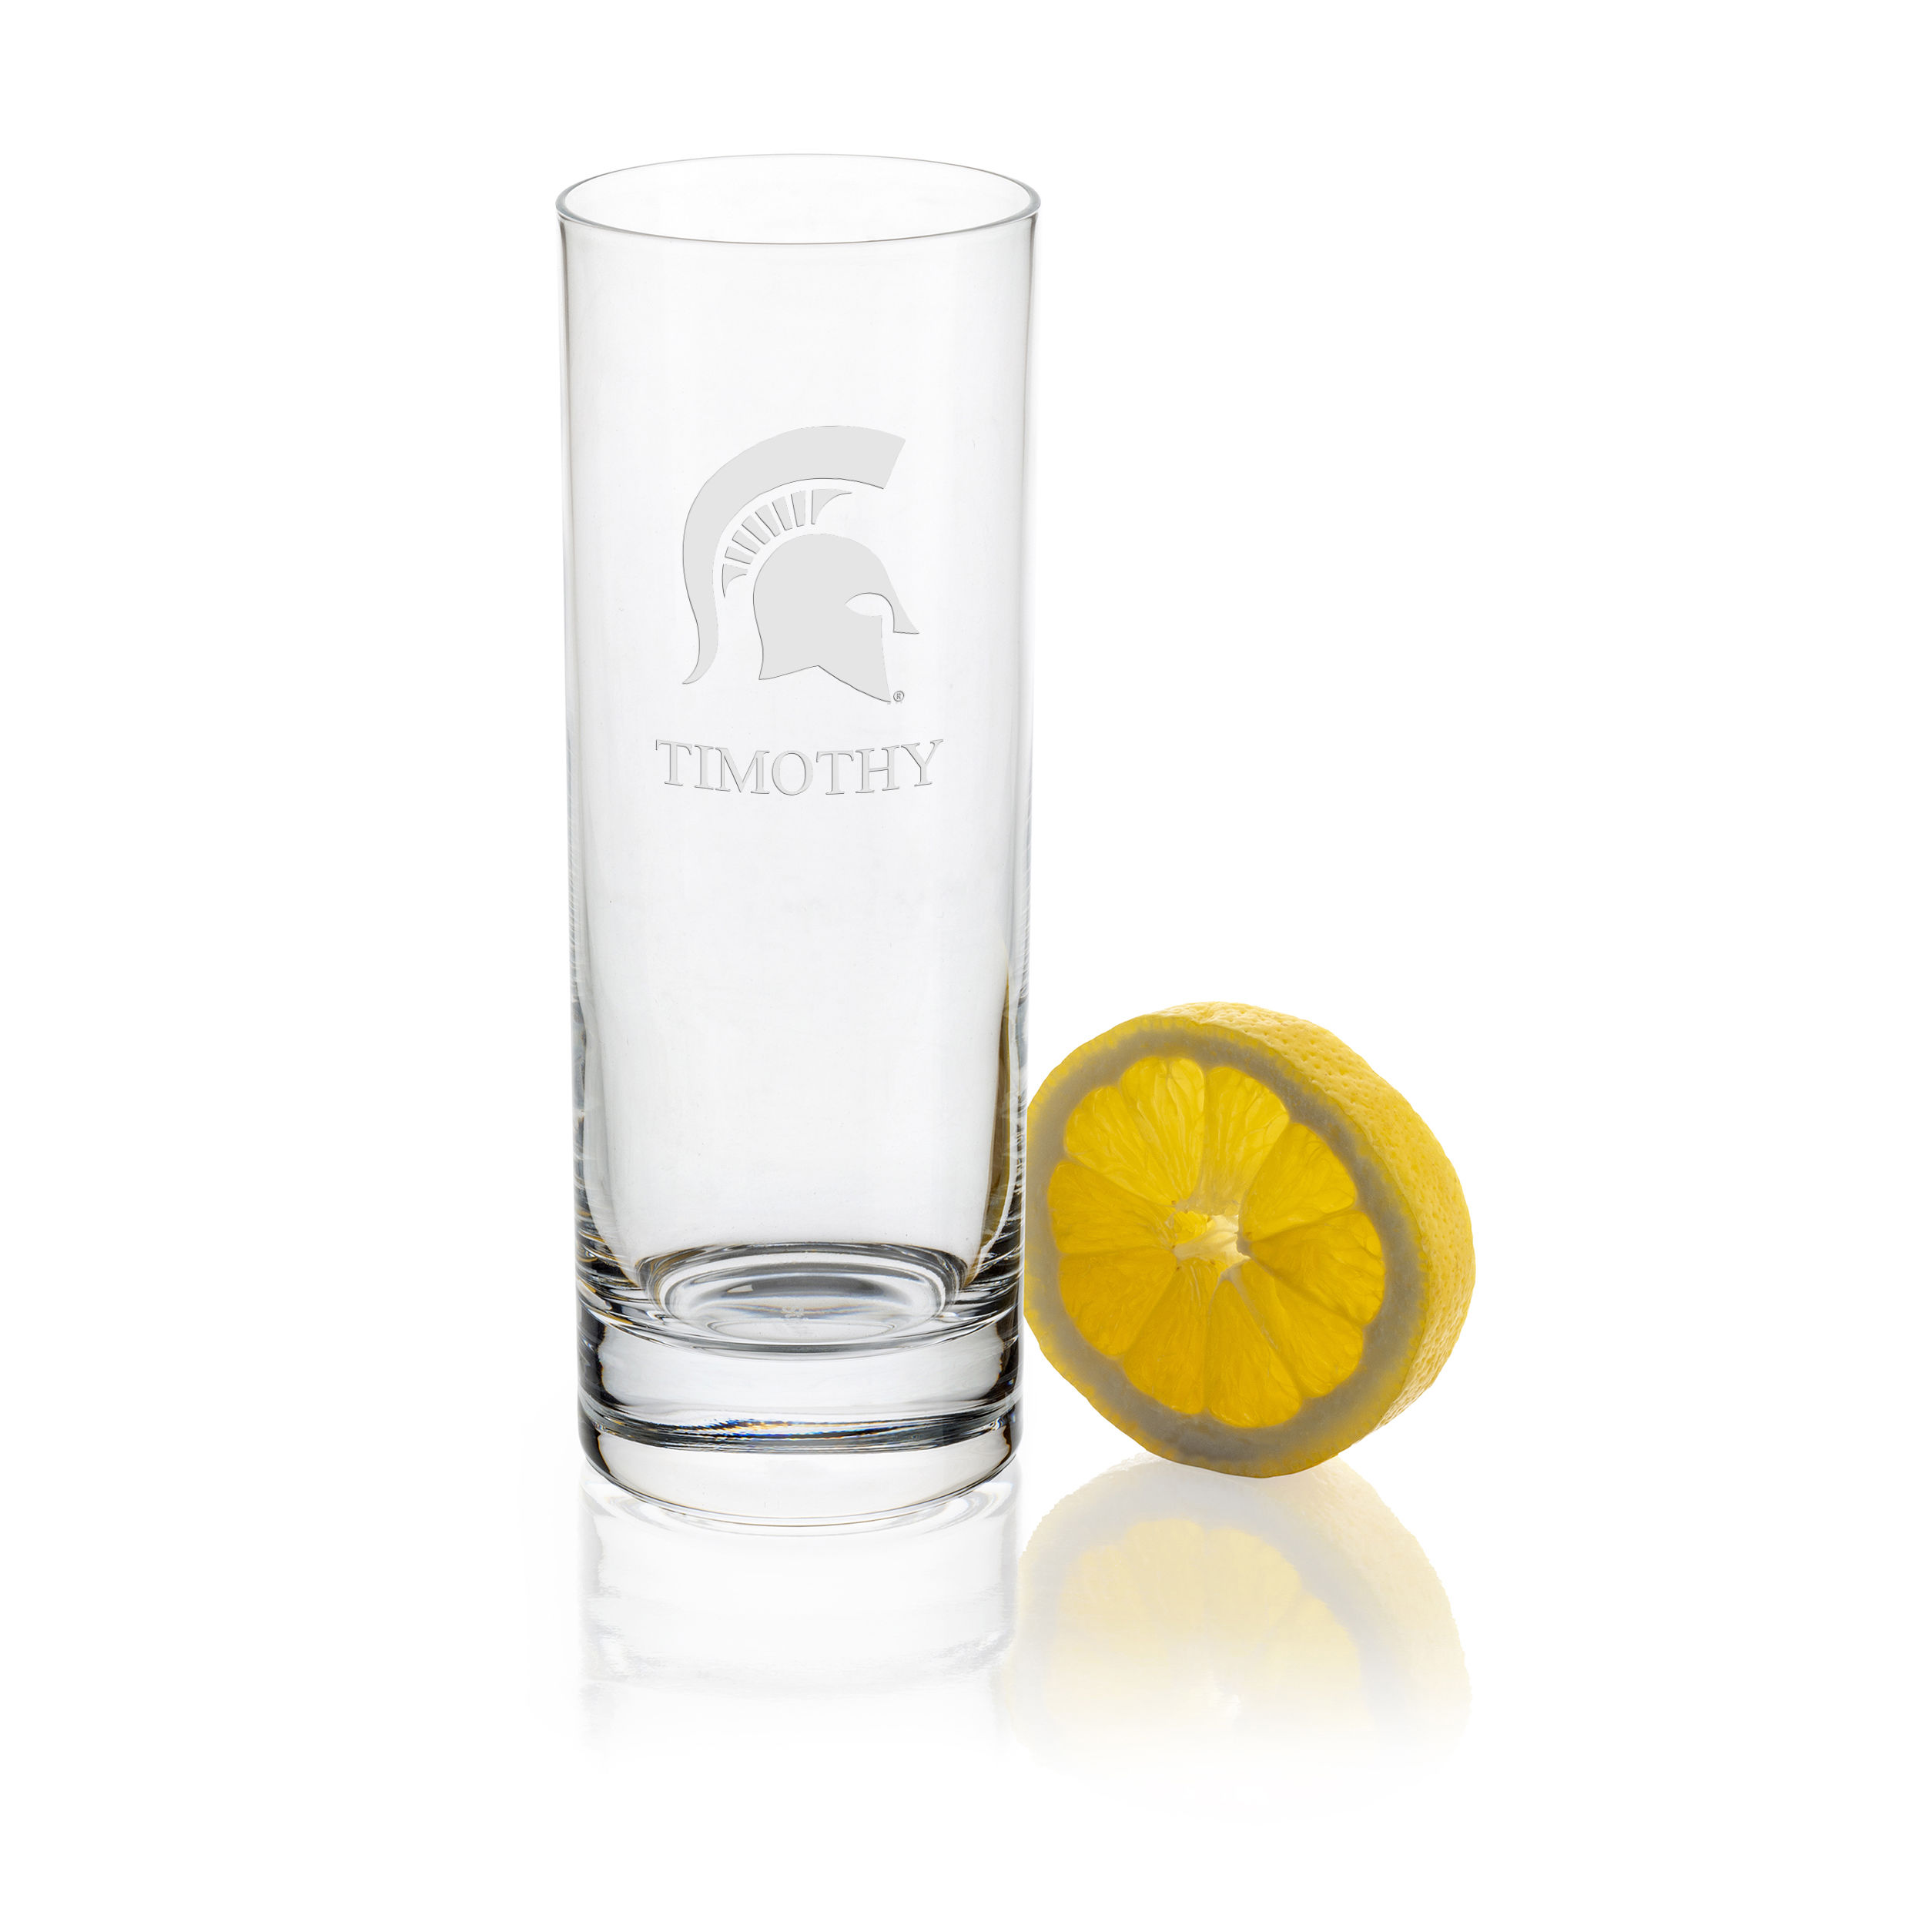 Michigan State University Iced Beverage Glasses - Set of 2